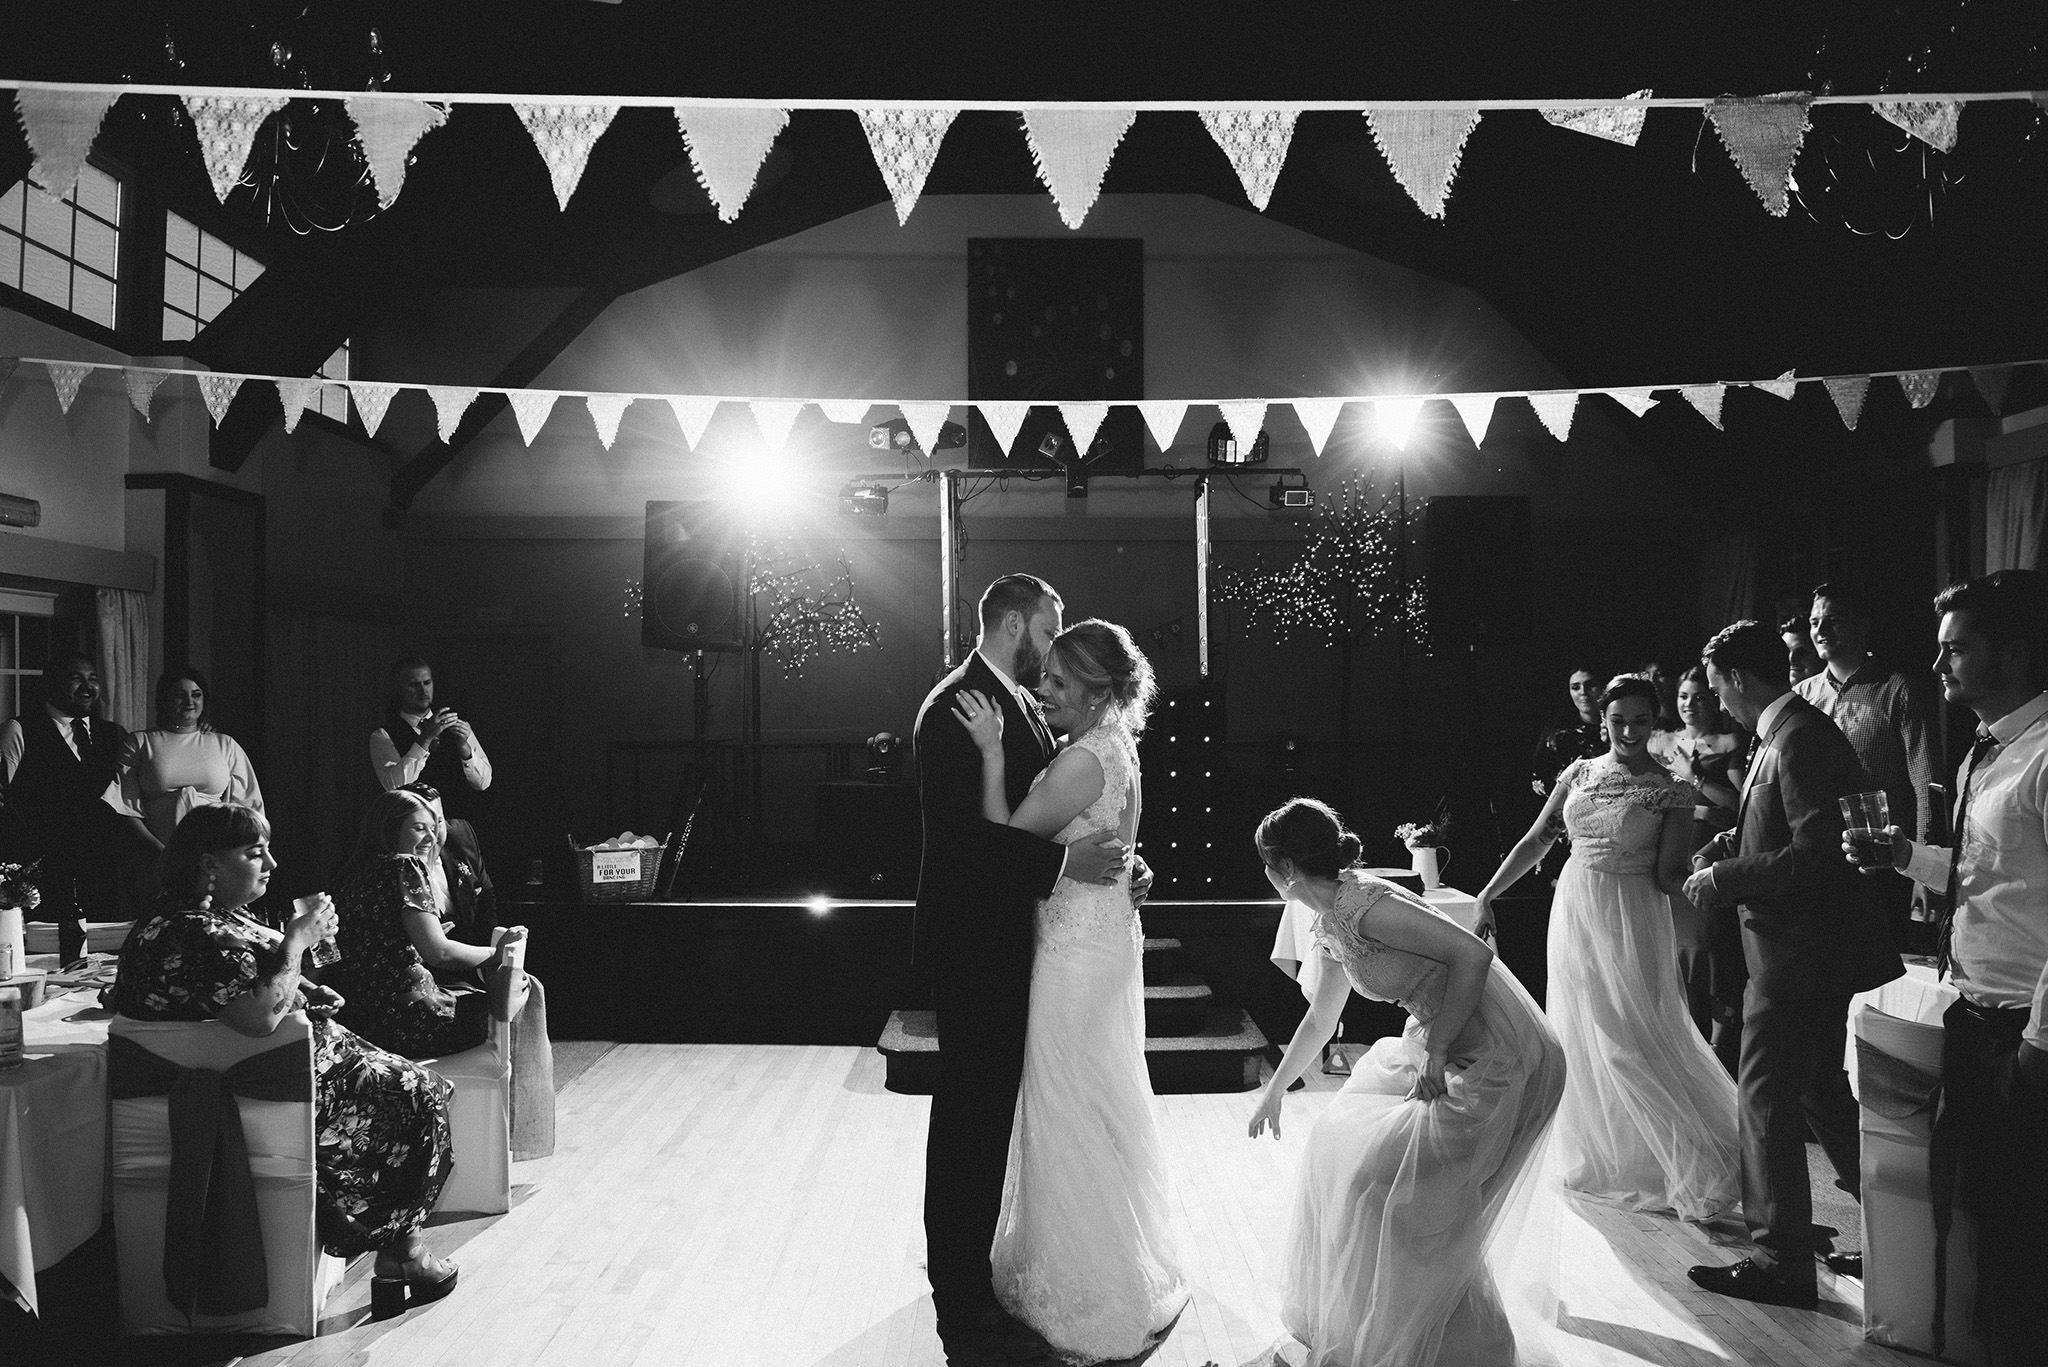 scott-stockwell-photography-wedding-15.jpg